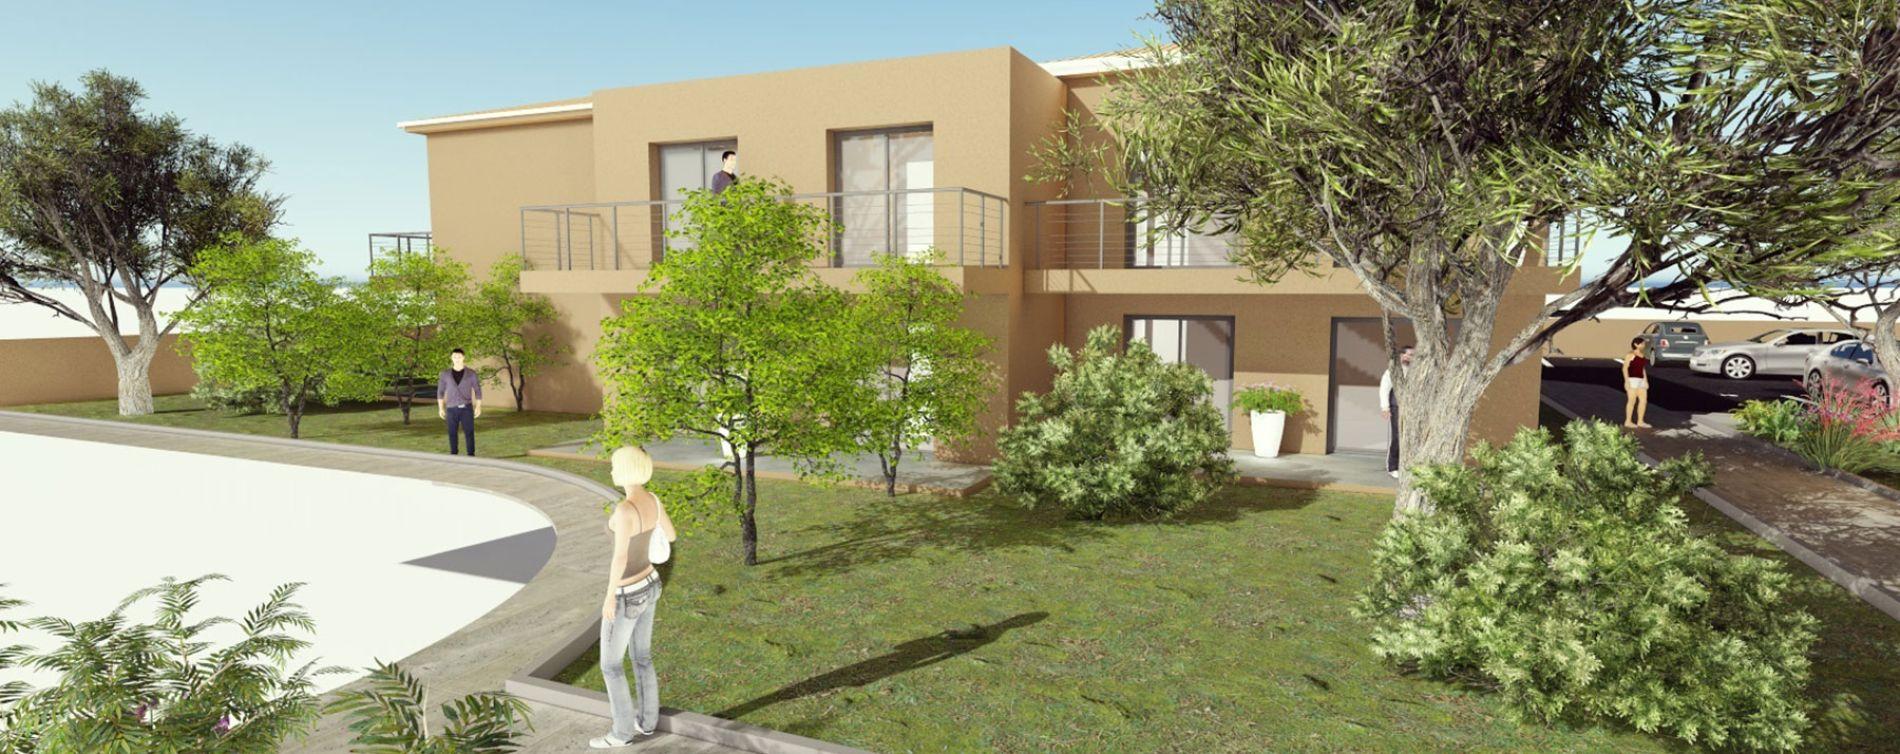 Cervione : programme immobilier neuve « Montecristo » (3)